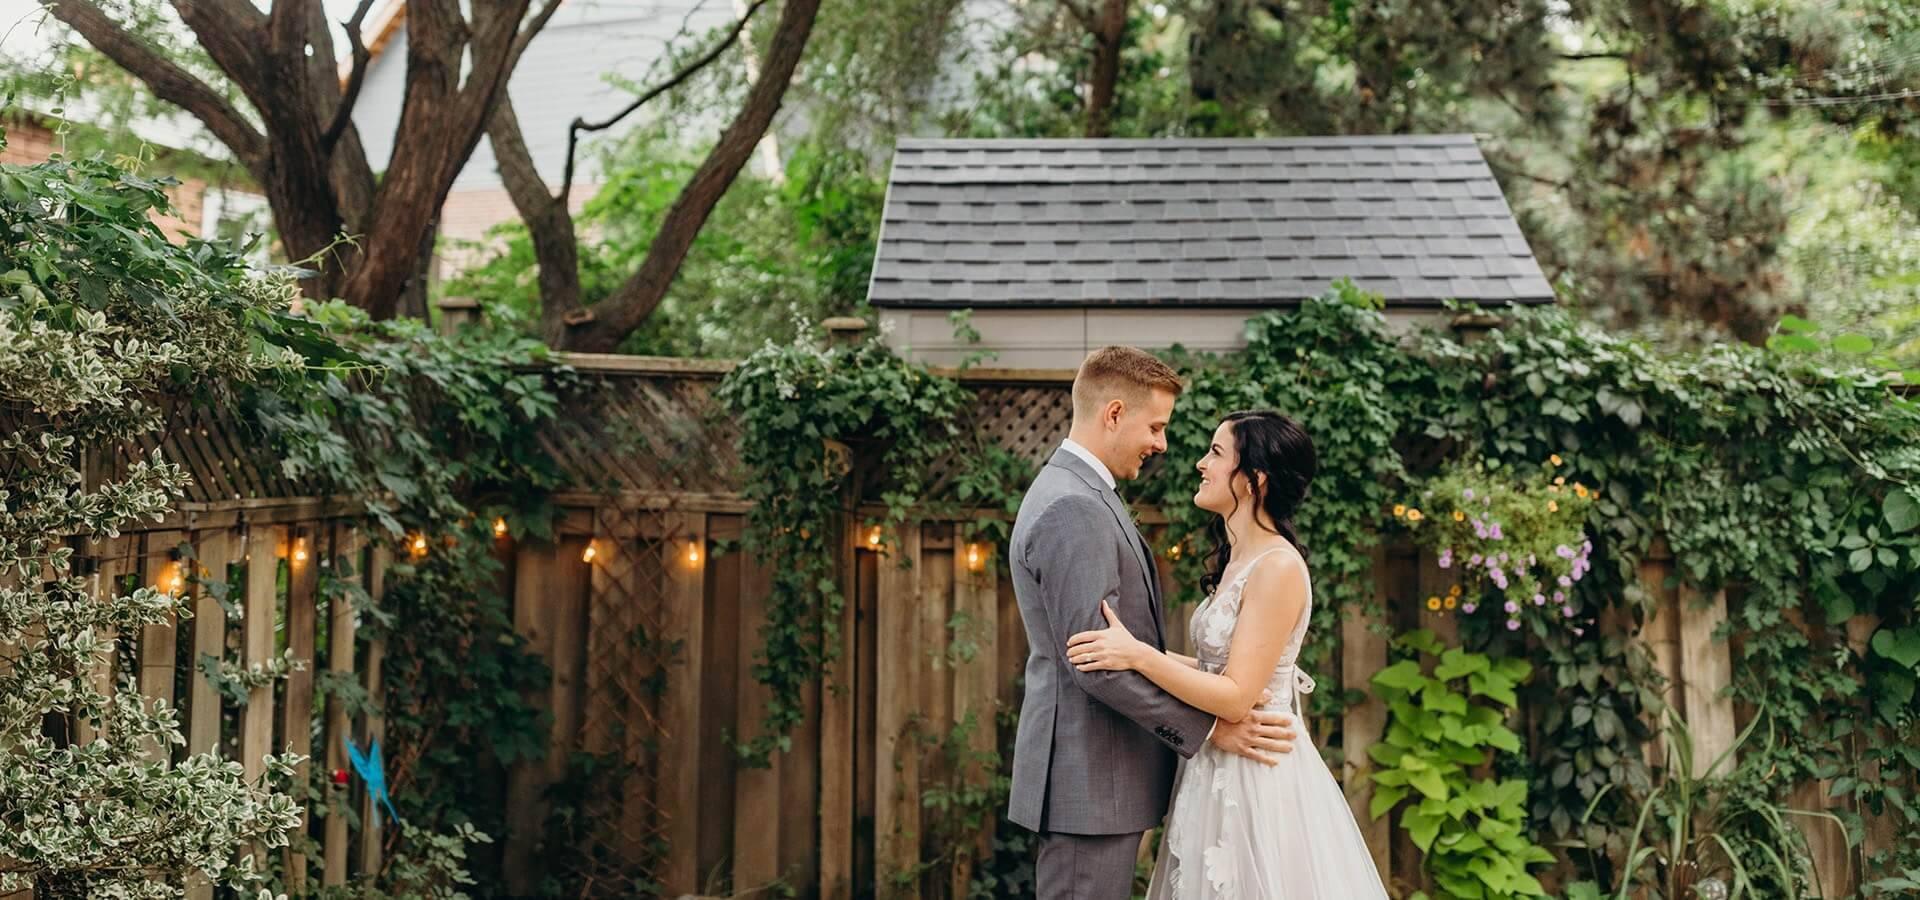 Hero image for 9 Tips for Planning a Fabulous Backyard Wedding